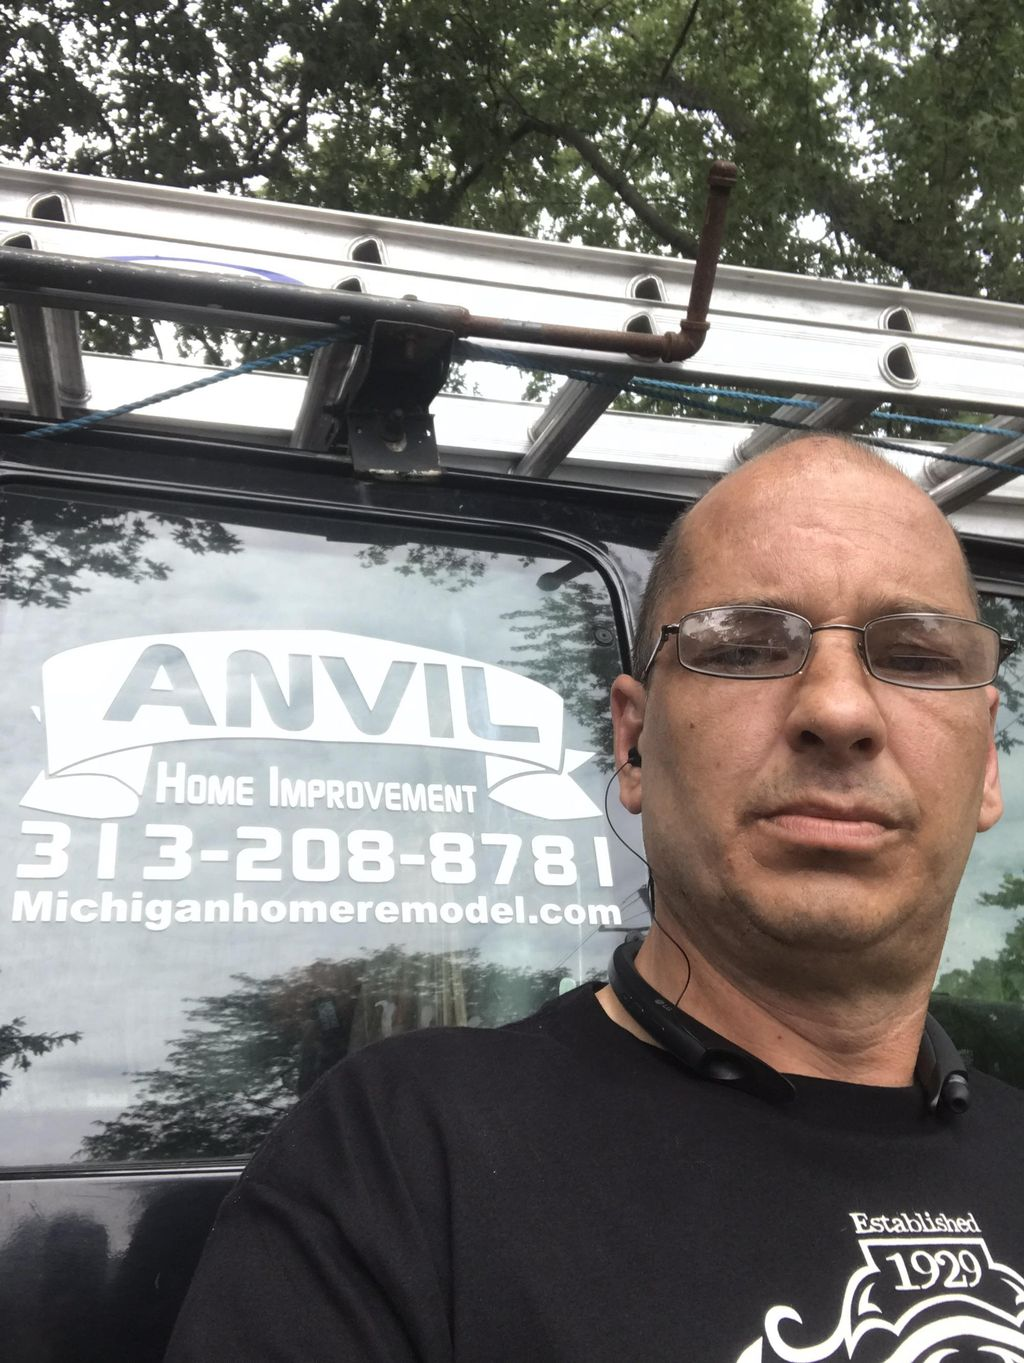 Anvil Home Improvements